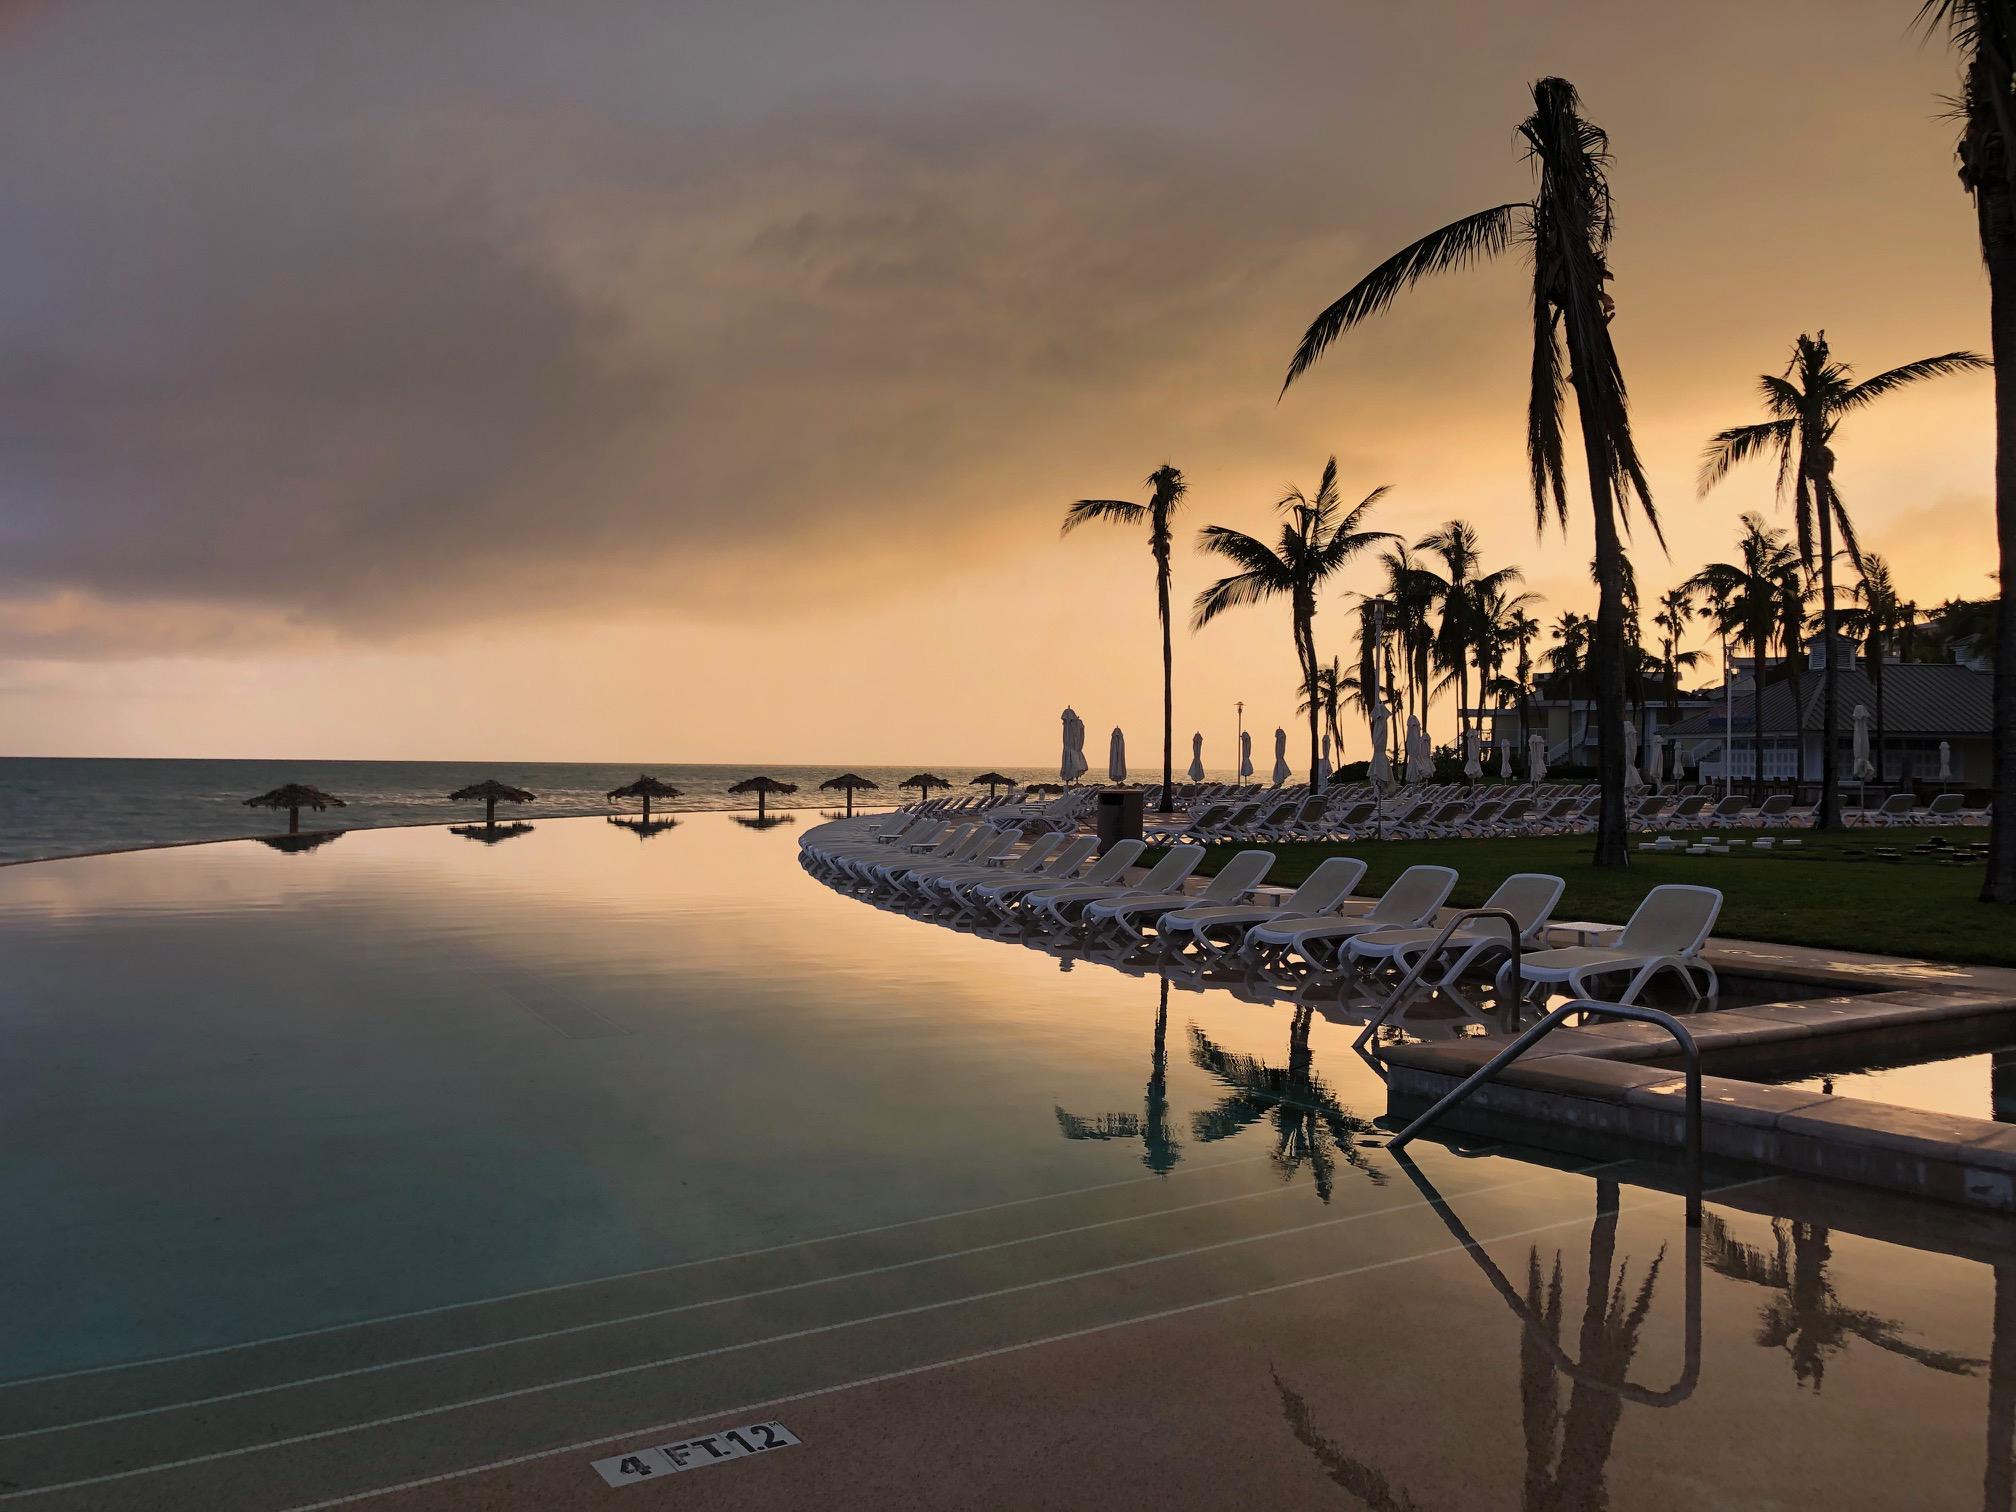 In Bahamas, hard-hit island beckons again...